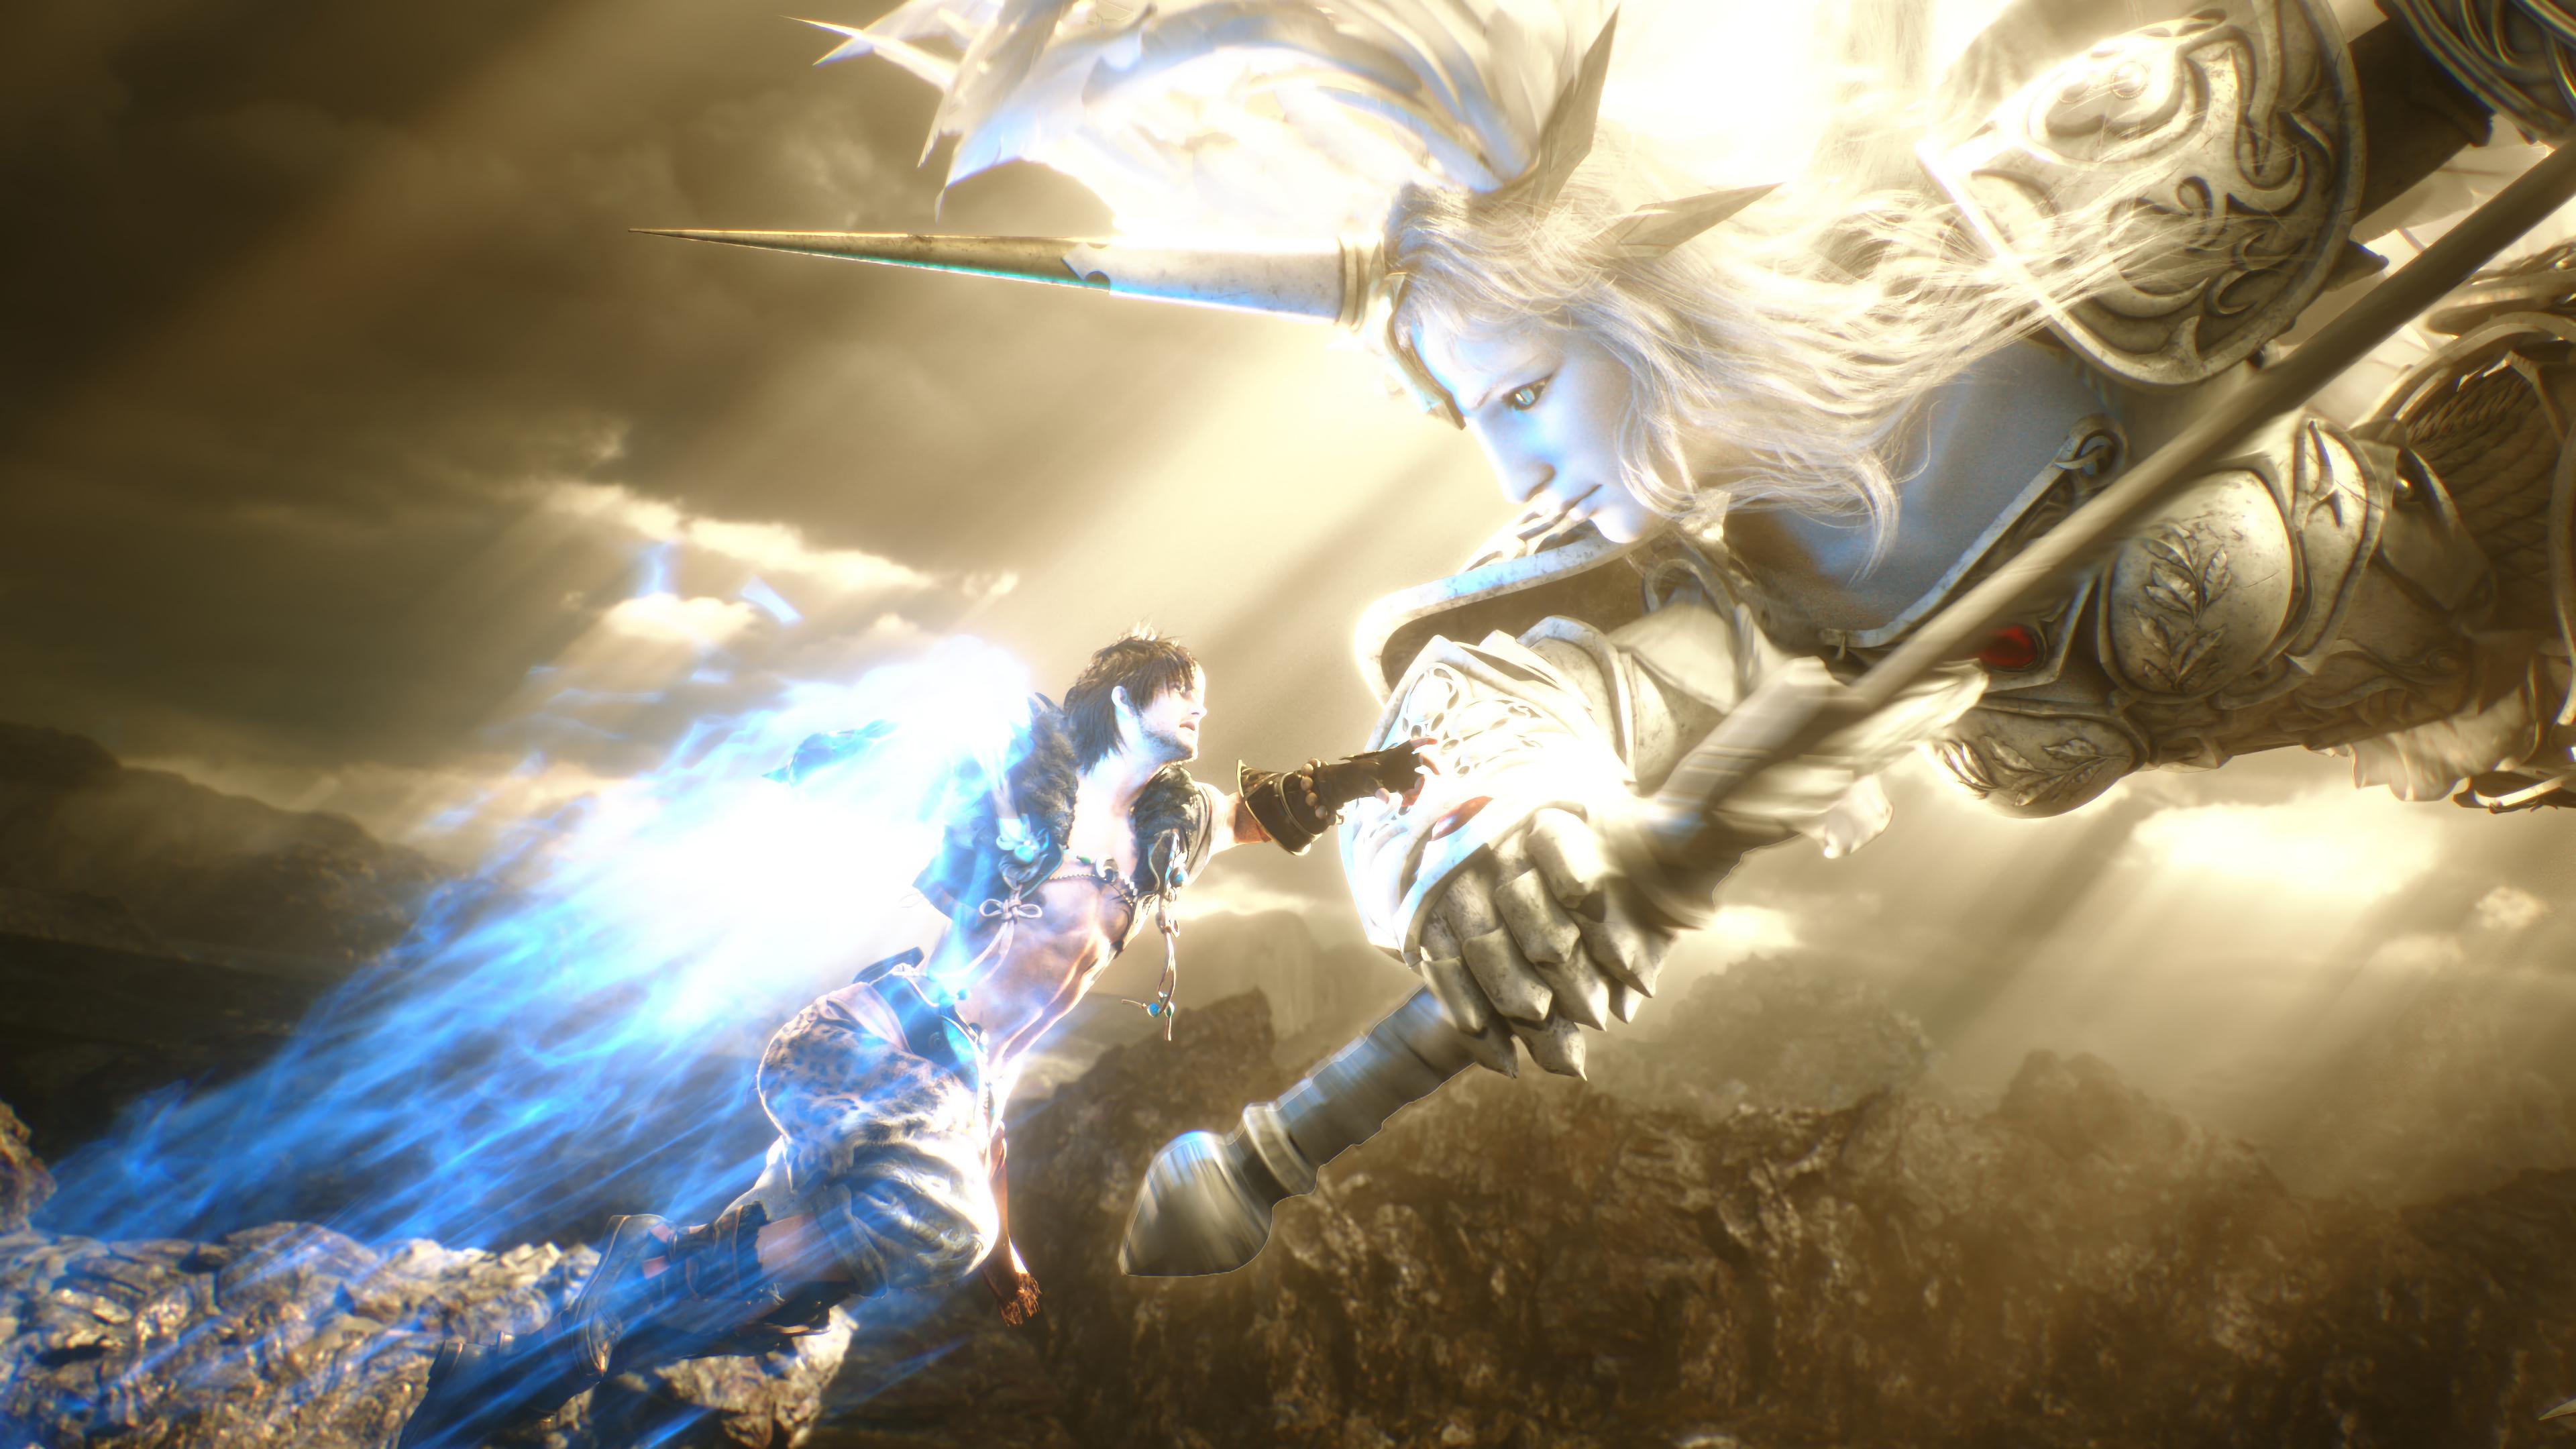 The next big dump of Final Fantasy XIV news is coming on October 18 screenshot